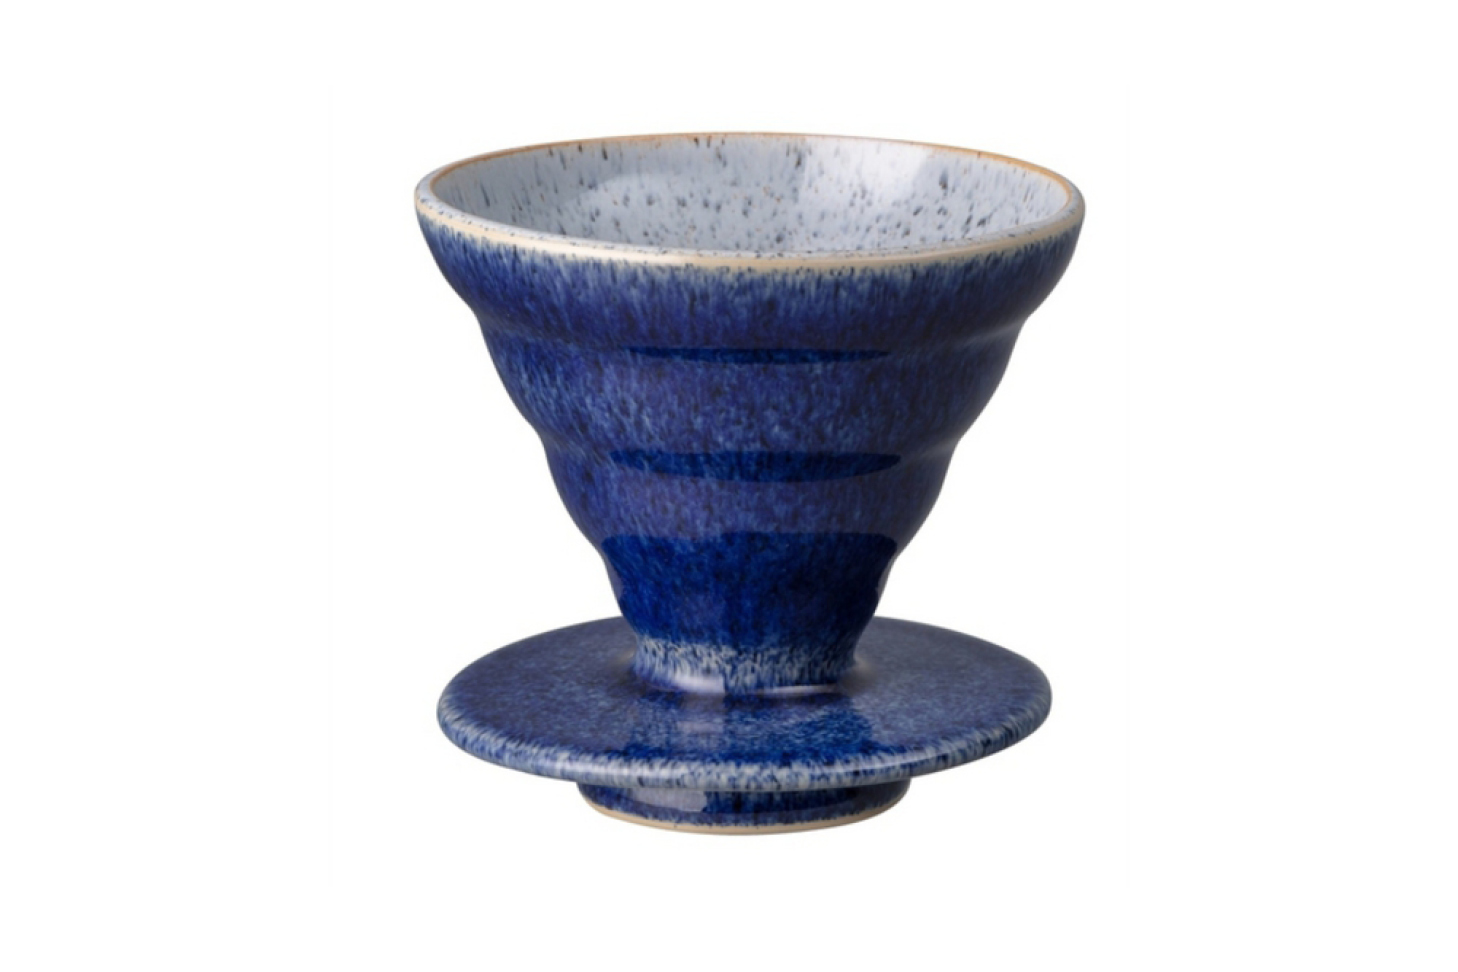 Denby Studio Blue Brew Slow Coffee Dripper